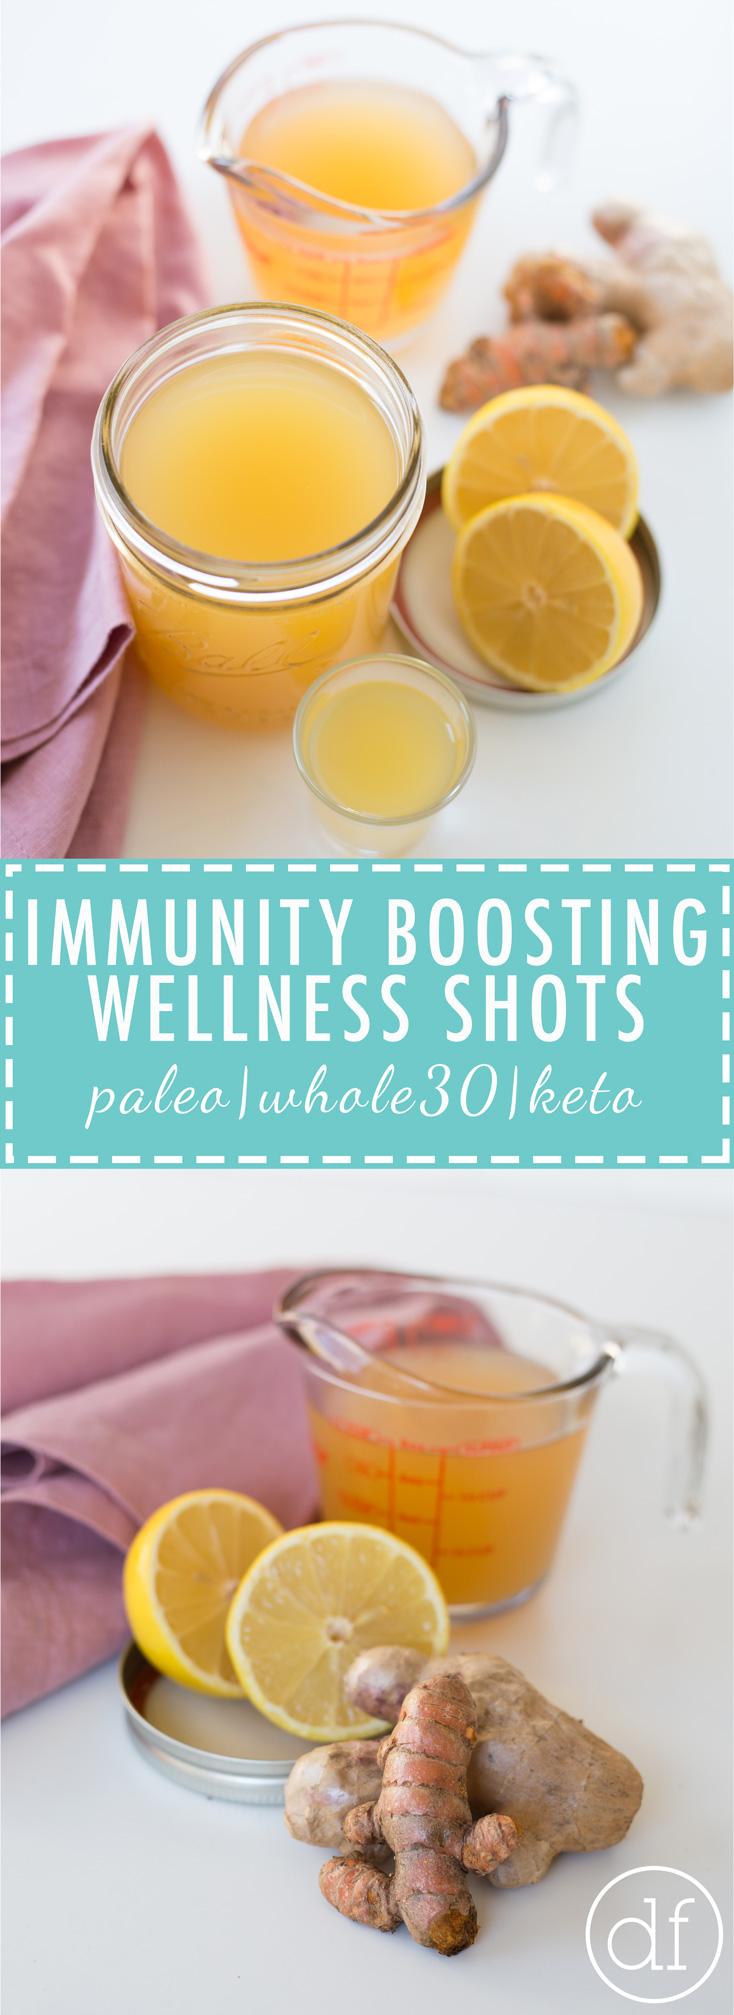 Immunity Boosting Wellness Shots, Immunity Boosting, Wellness Shots, Anti Inflammatory, Turmeric Shots, Apple Cider Vinegar, Define Fettle